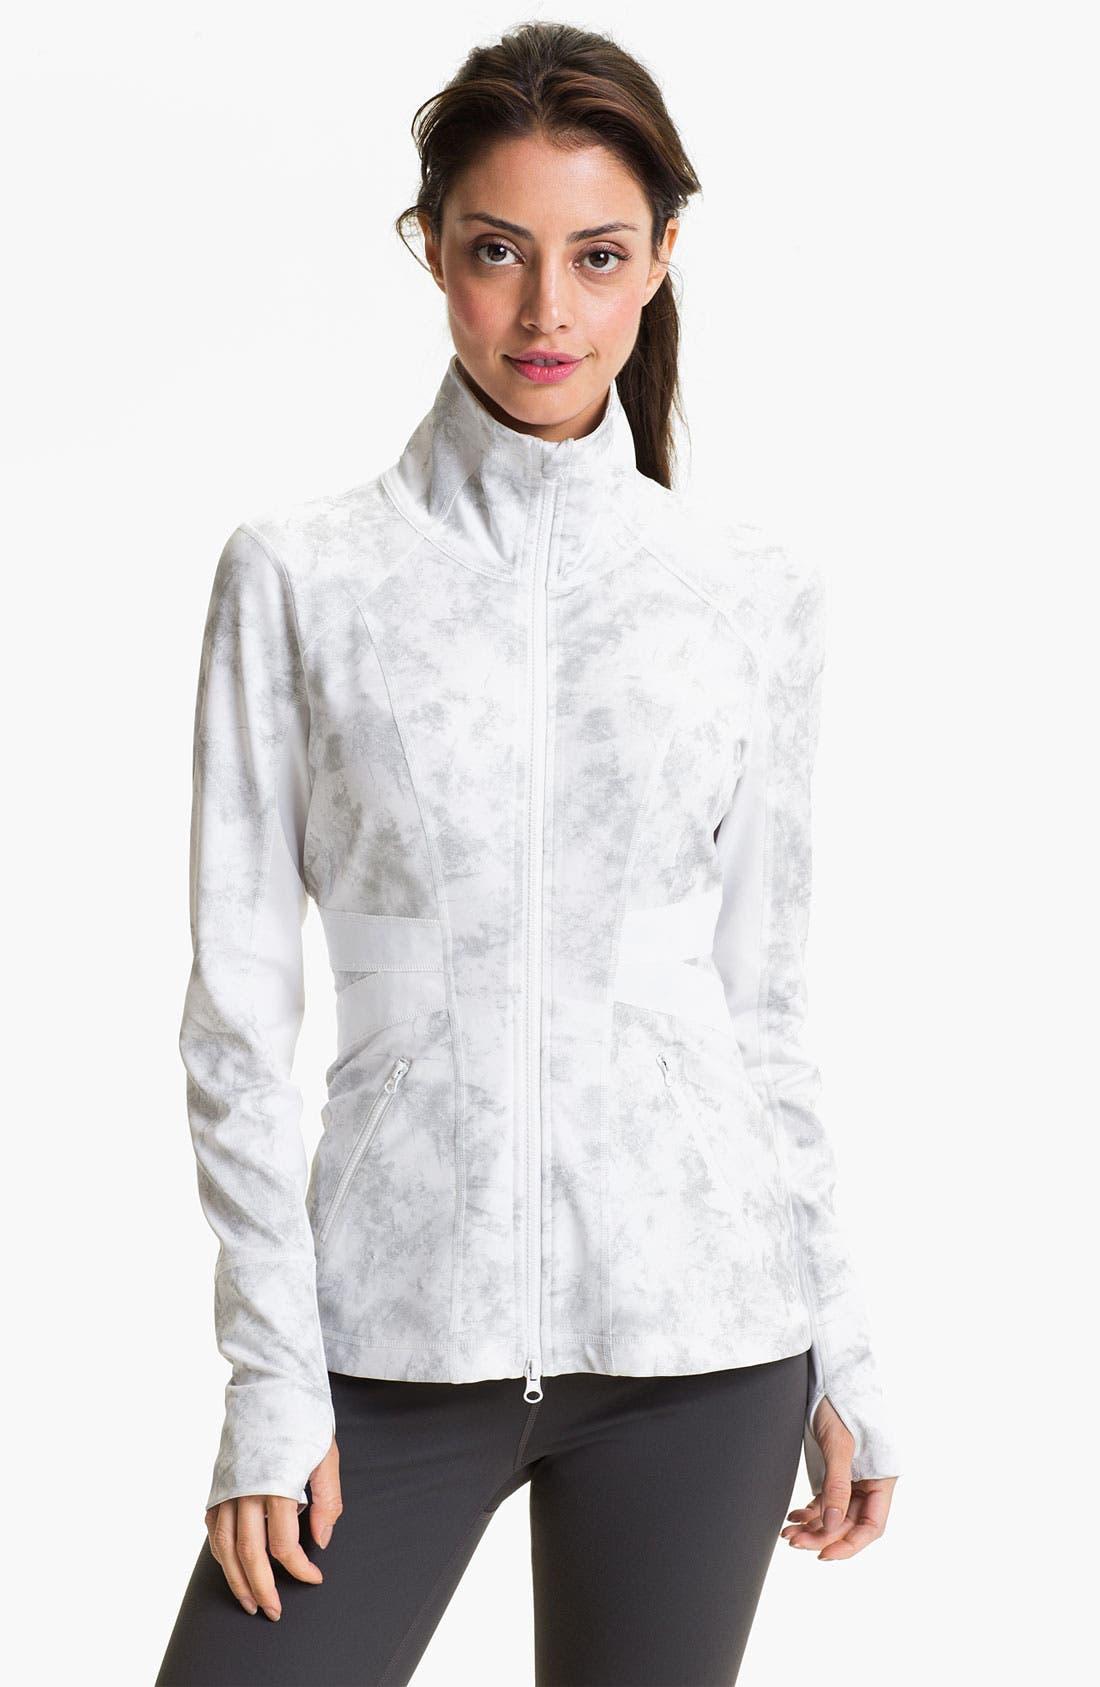 Main Image - Zella 'Karin' Fitted Jacket